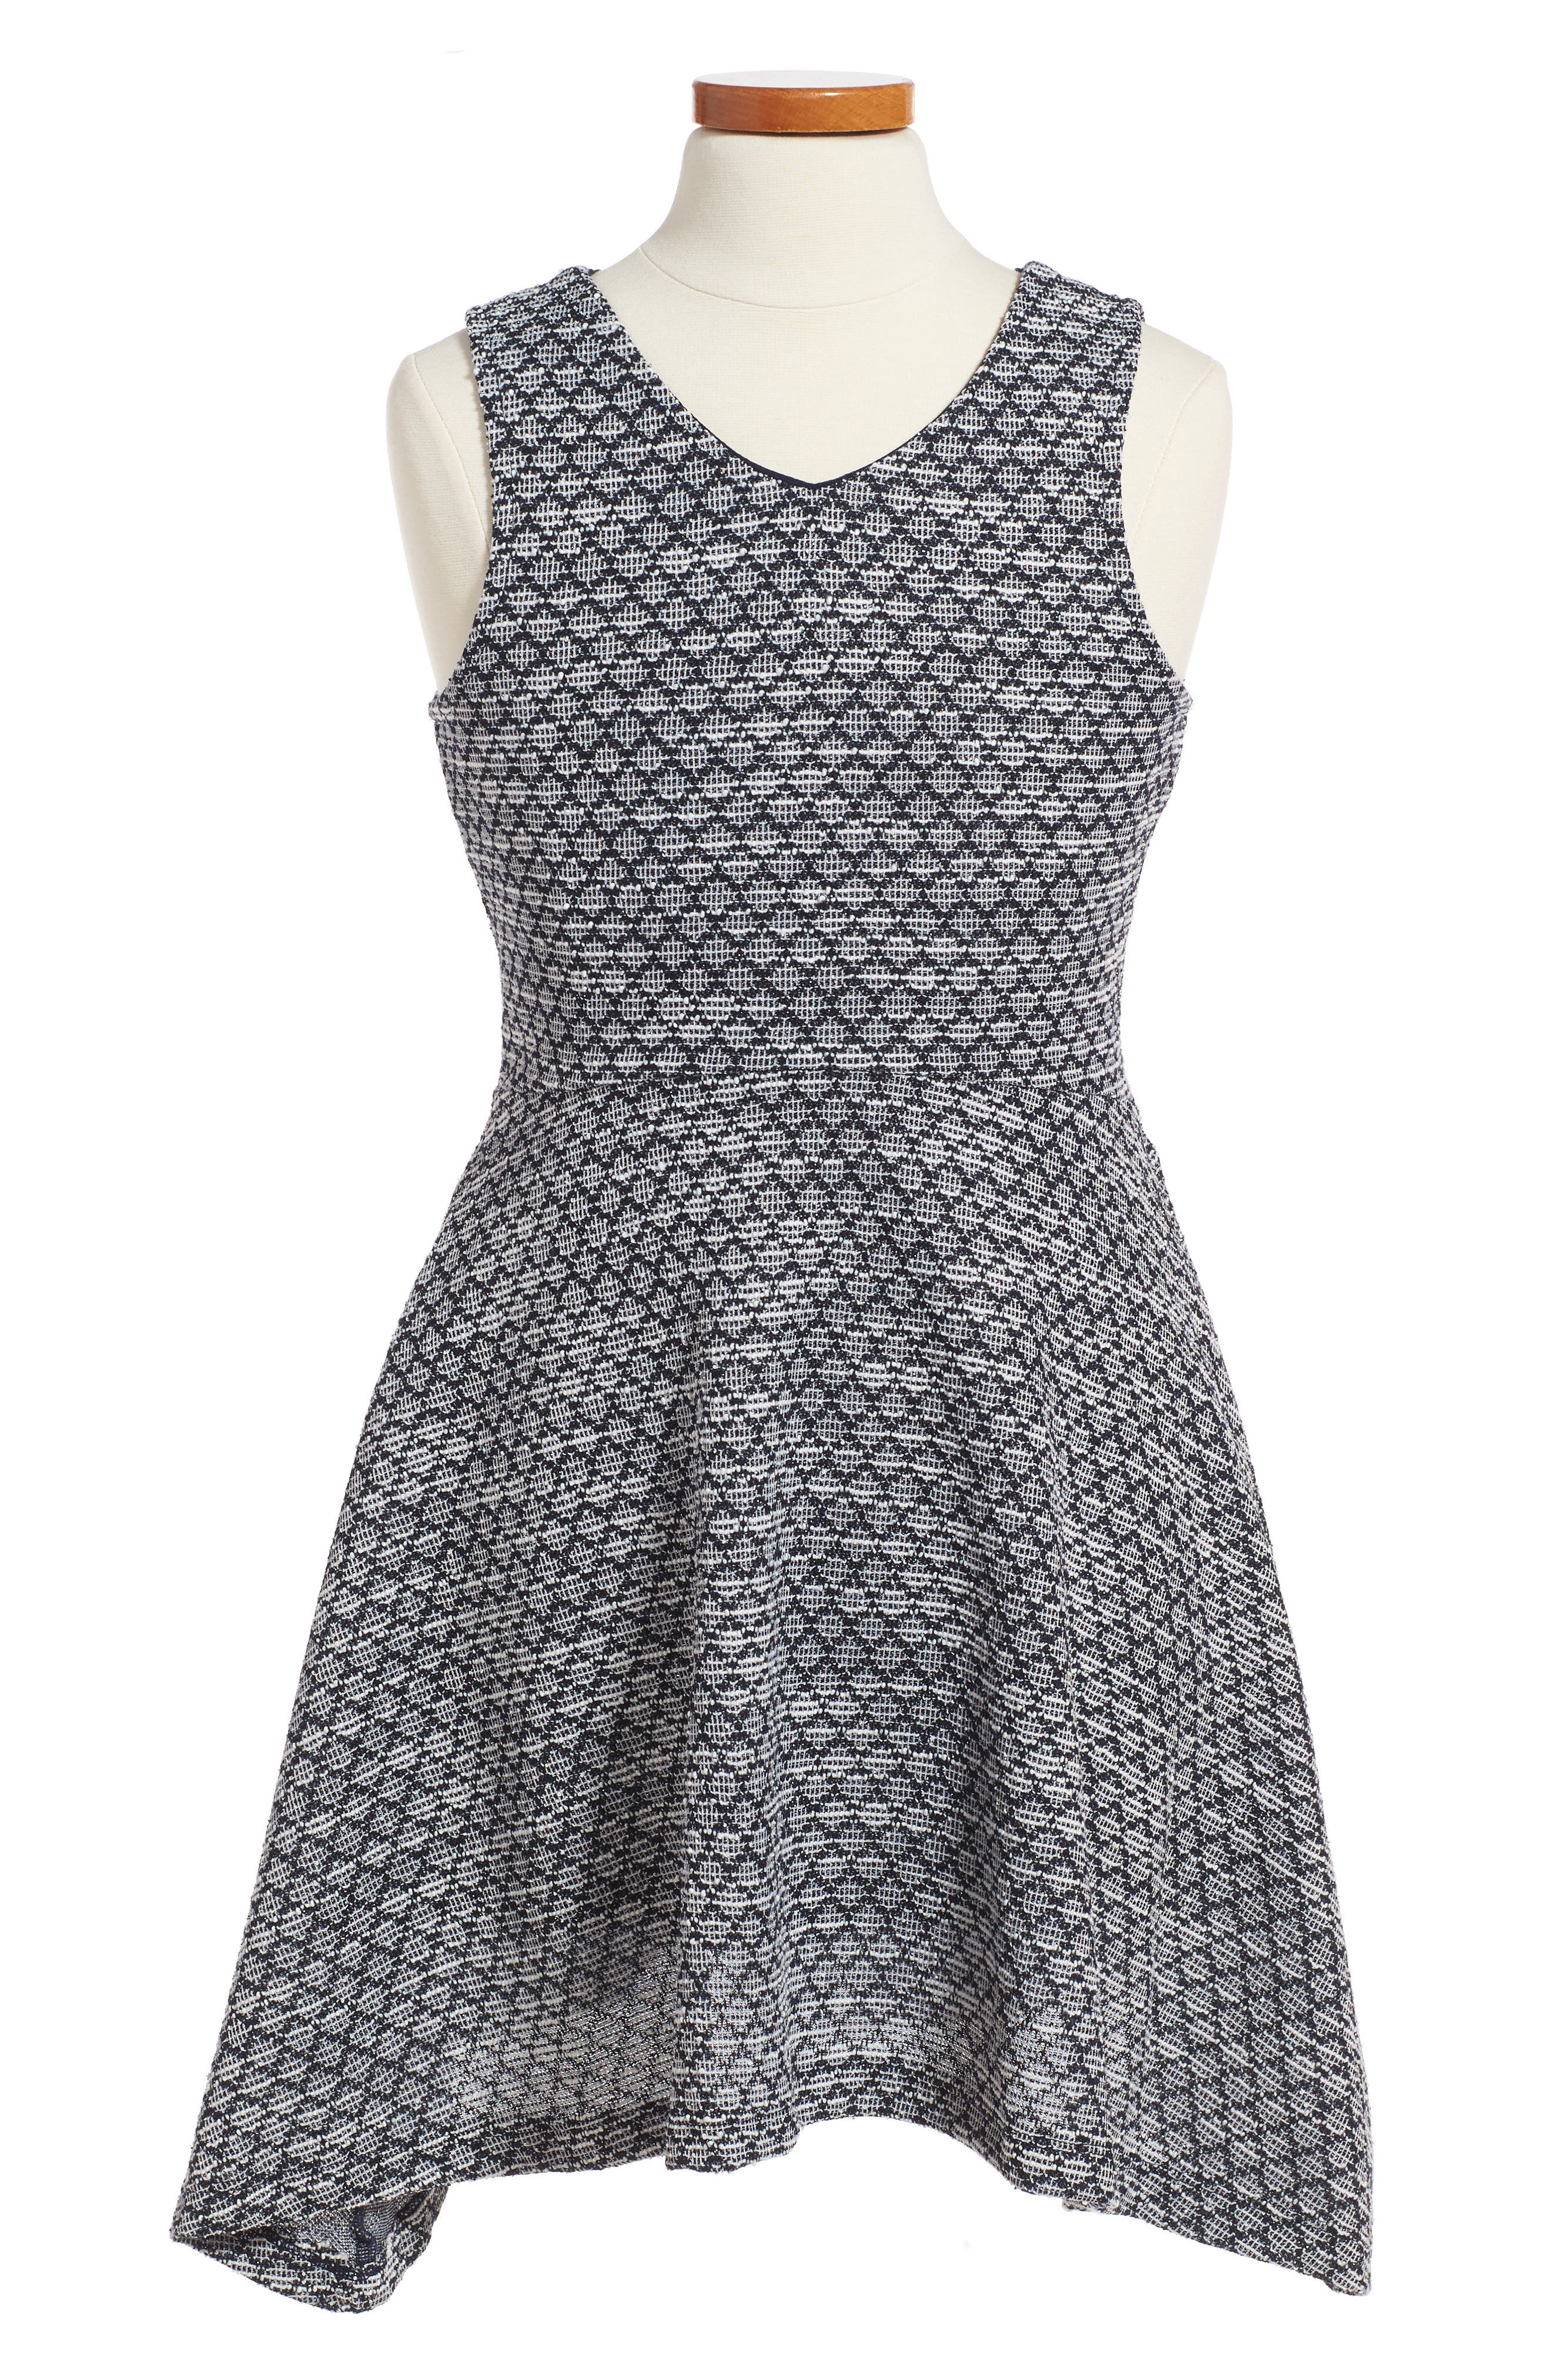 Alternate Image 1 Selected - Elisa B Lolita Sleeveless Skater Dress (Big Girls)